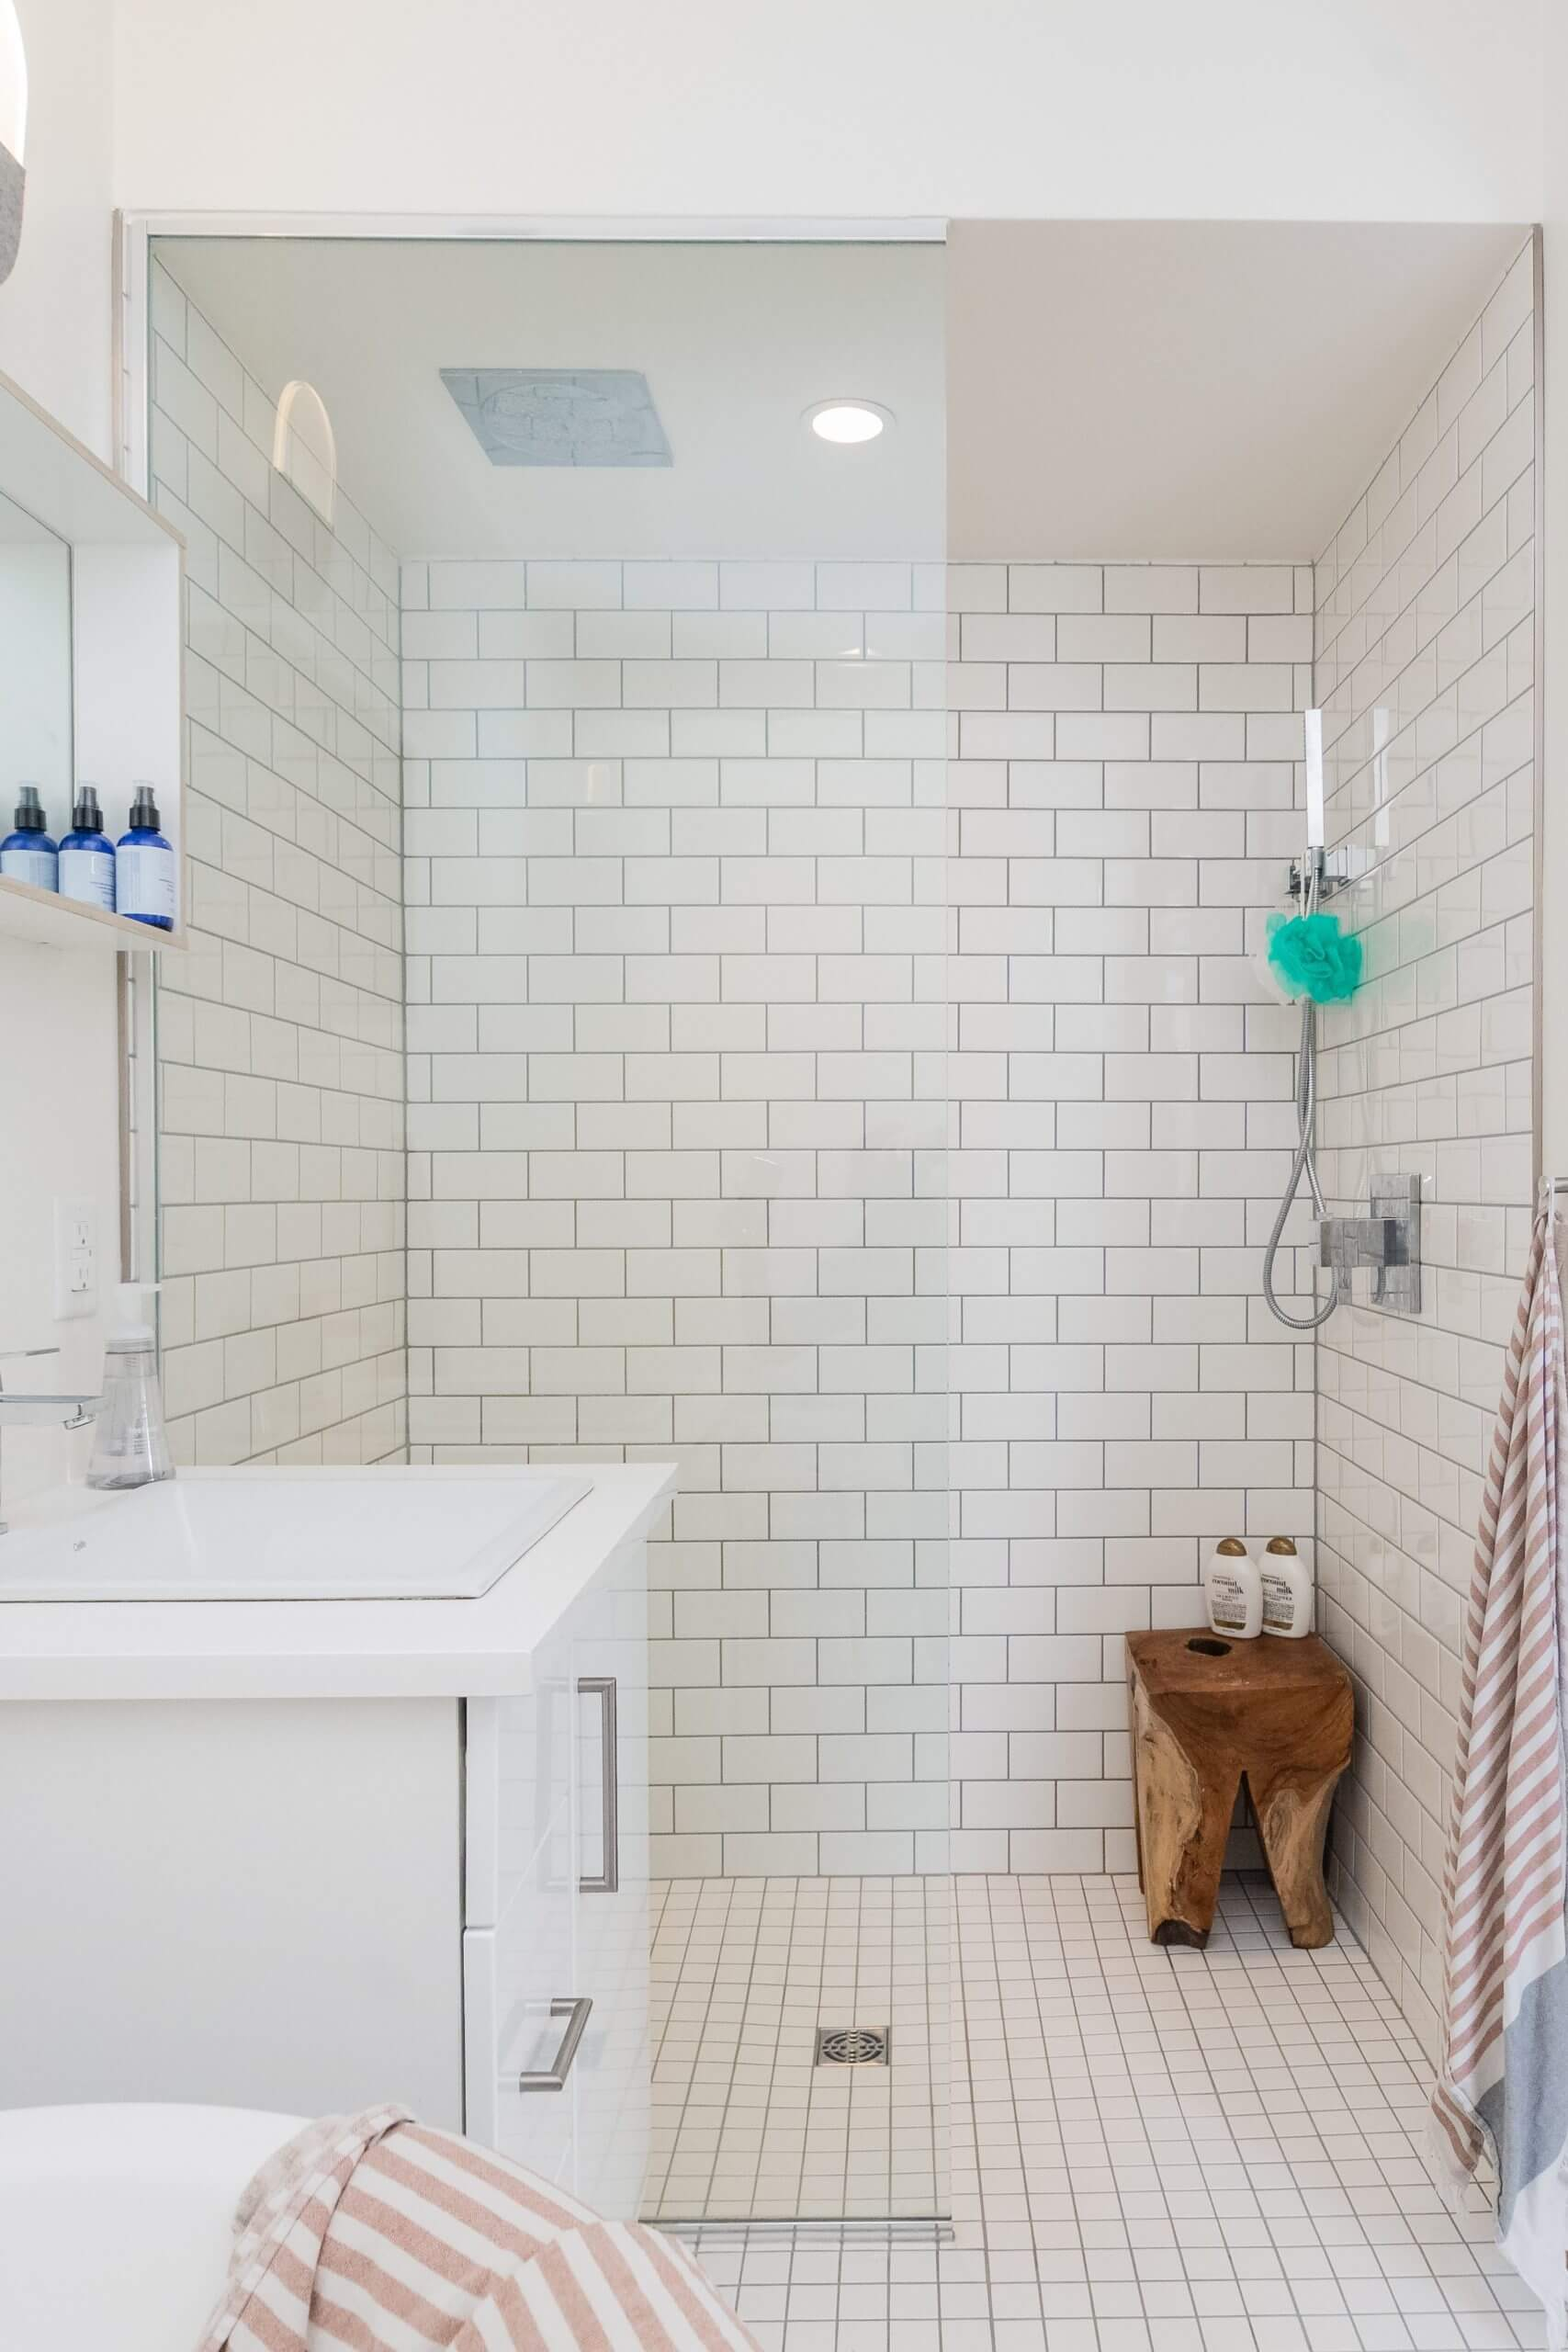 Montreal bathroom reno specialists in tapware